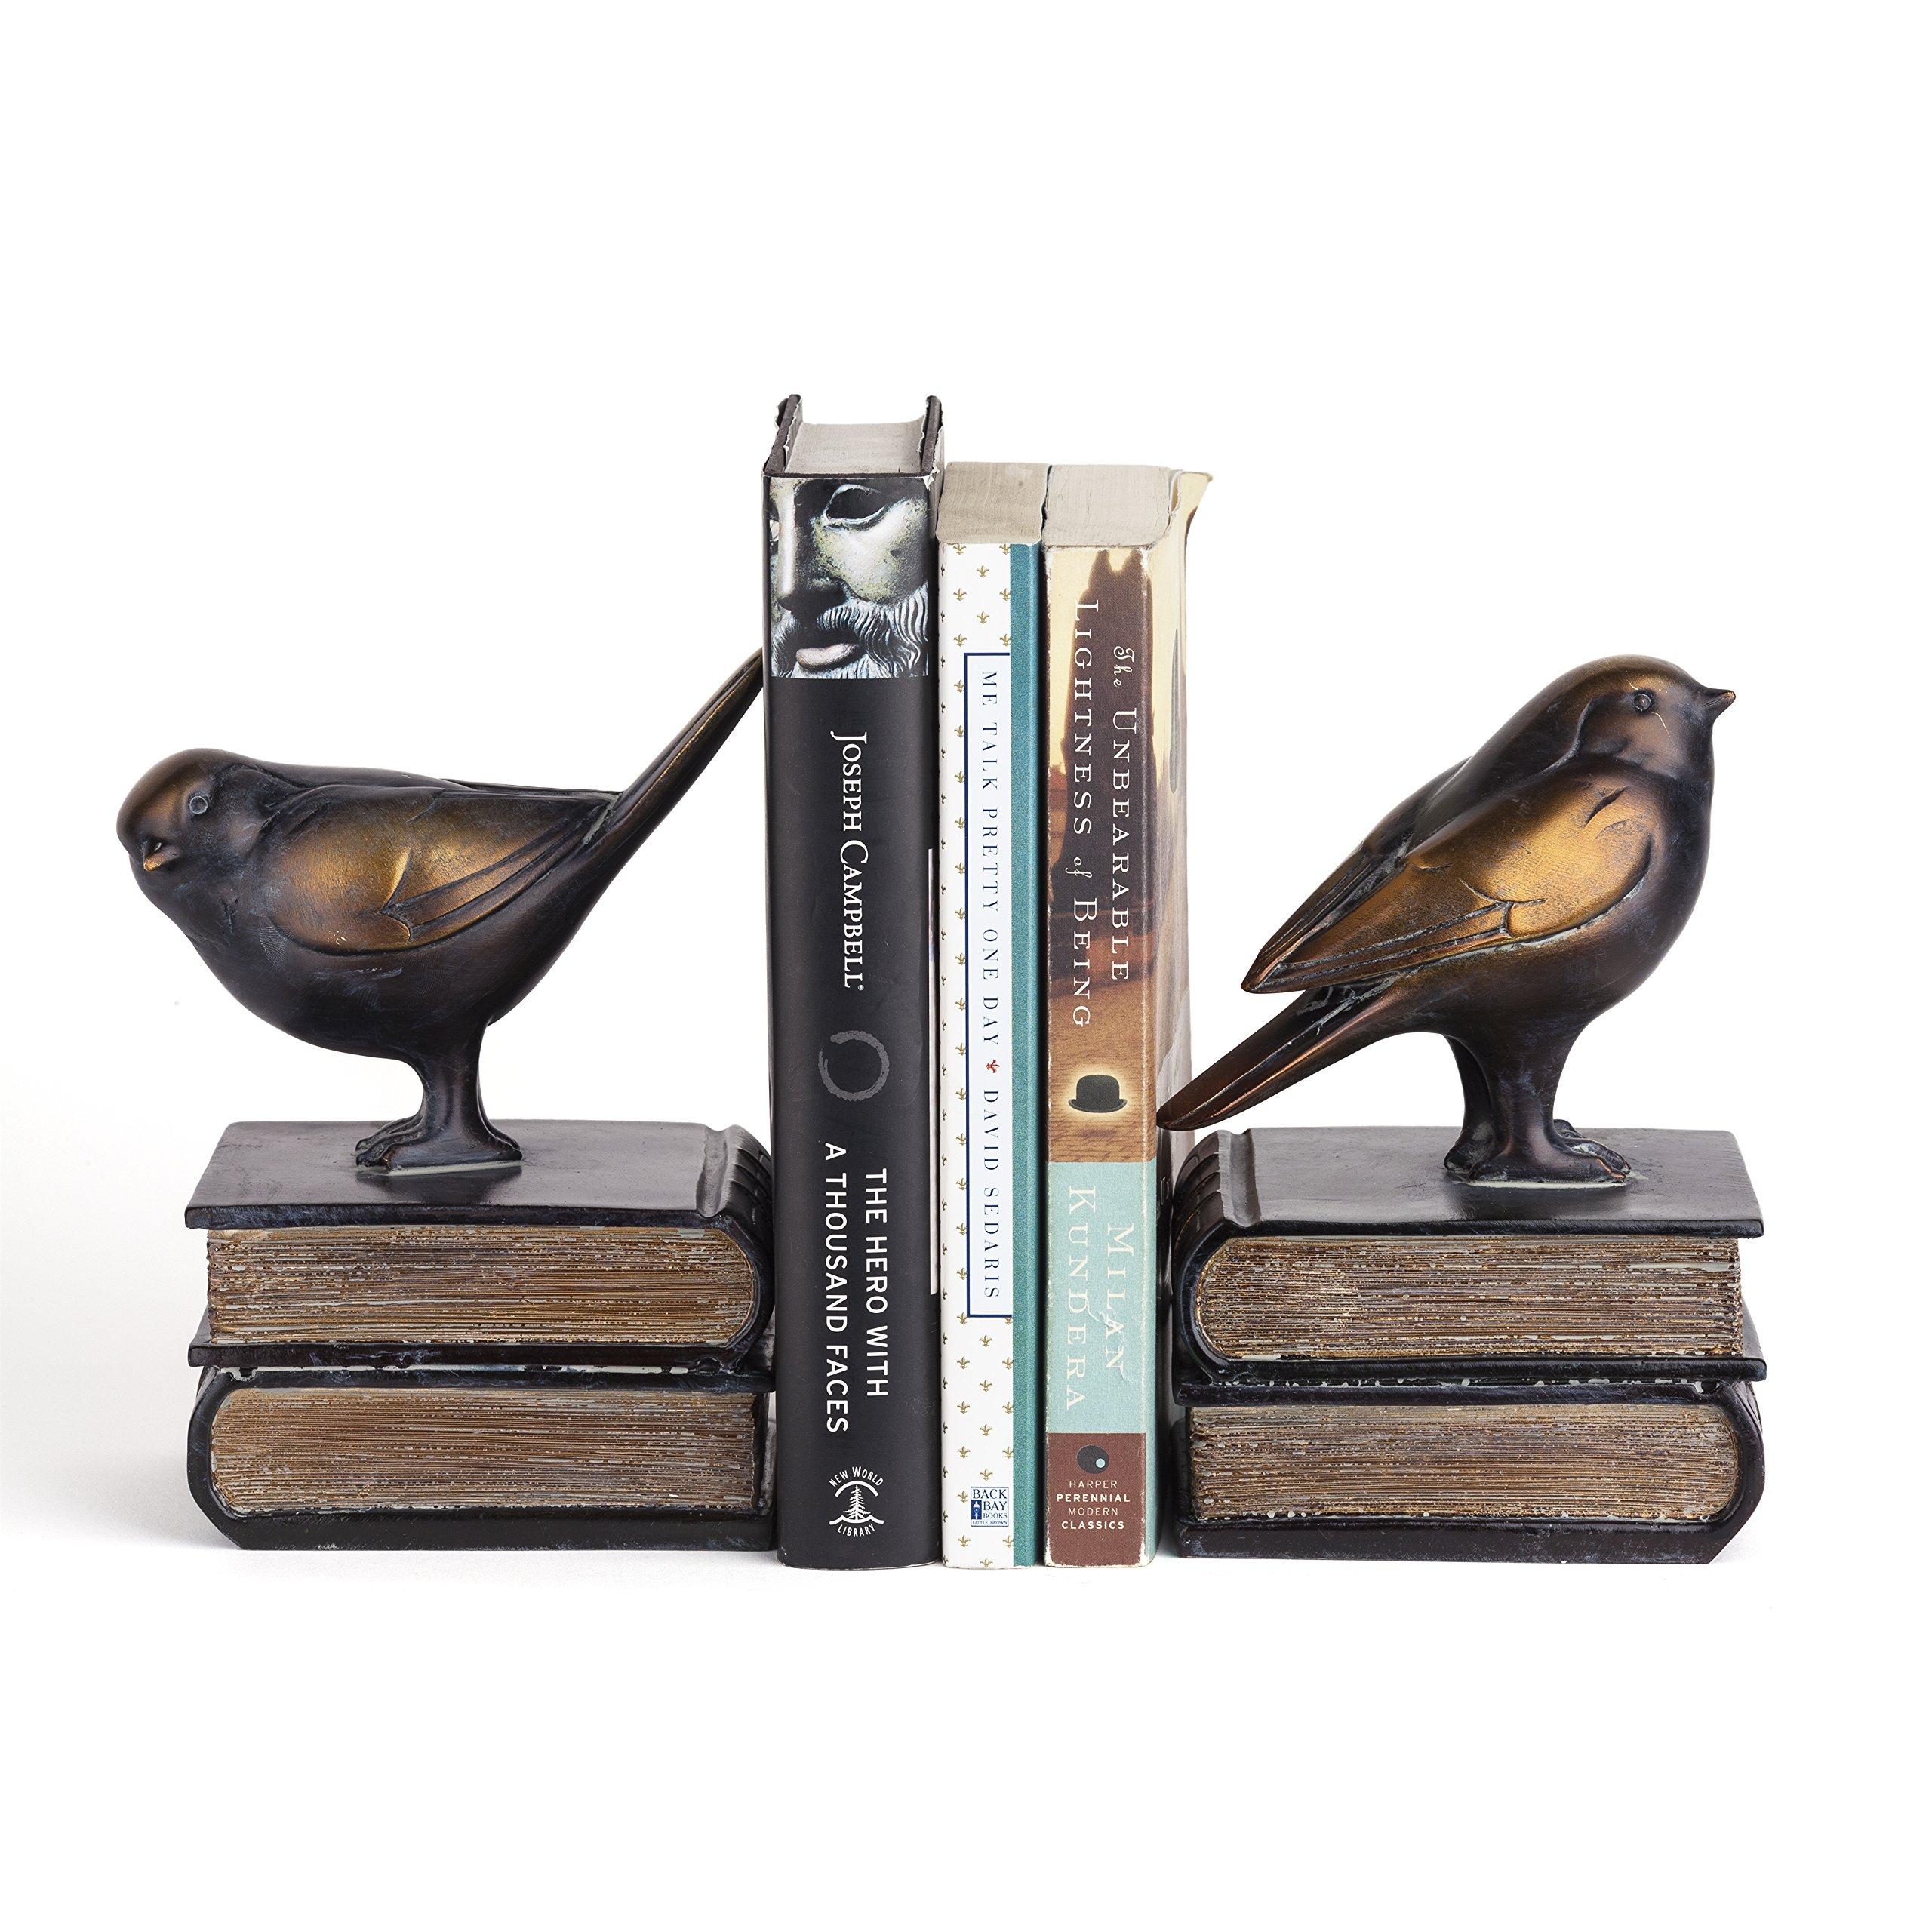 Danya B. DS781 Decorative Rustic Bookshelf Decor - Birds on Books Bookend Set - Bronze by Danya B